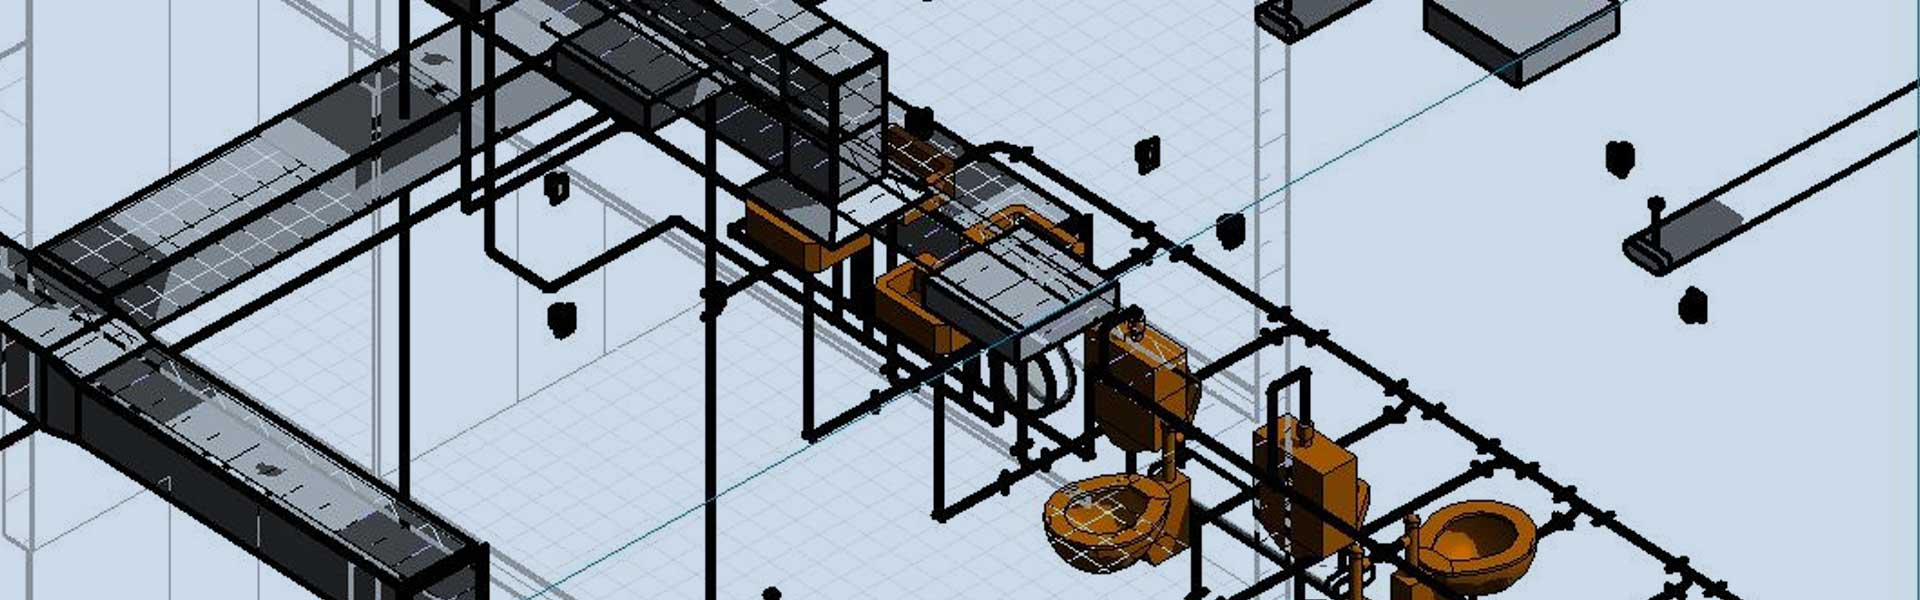 AutoCAD design build software cedar rapids iowa city dubuque iowa